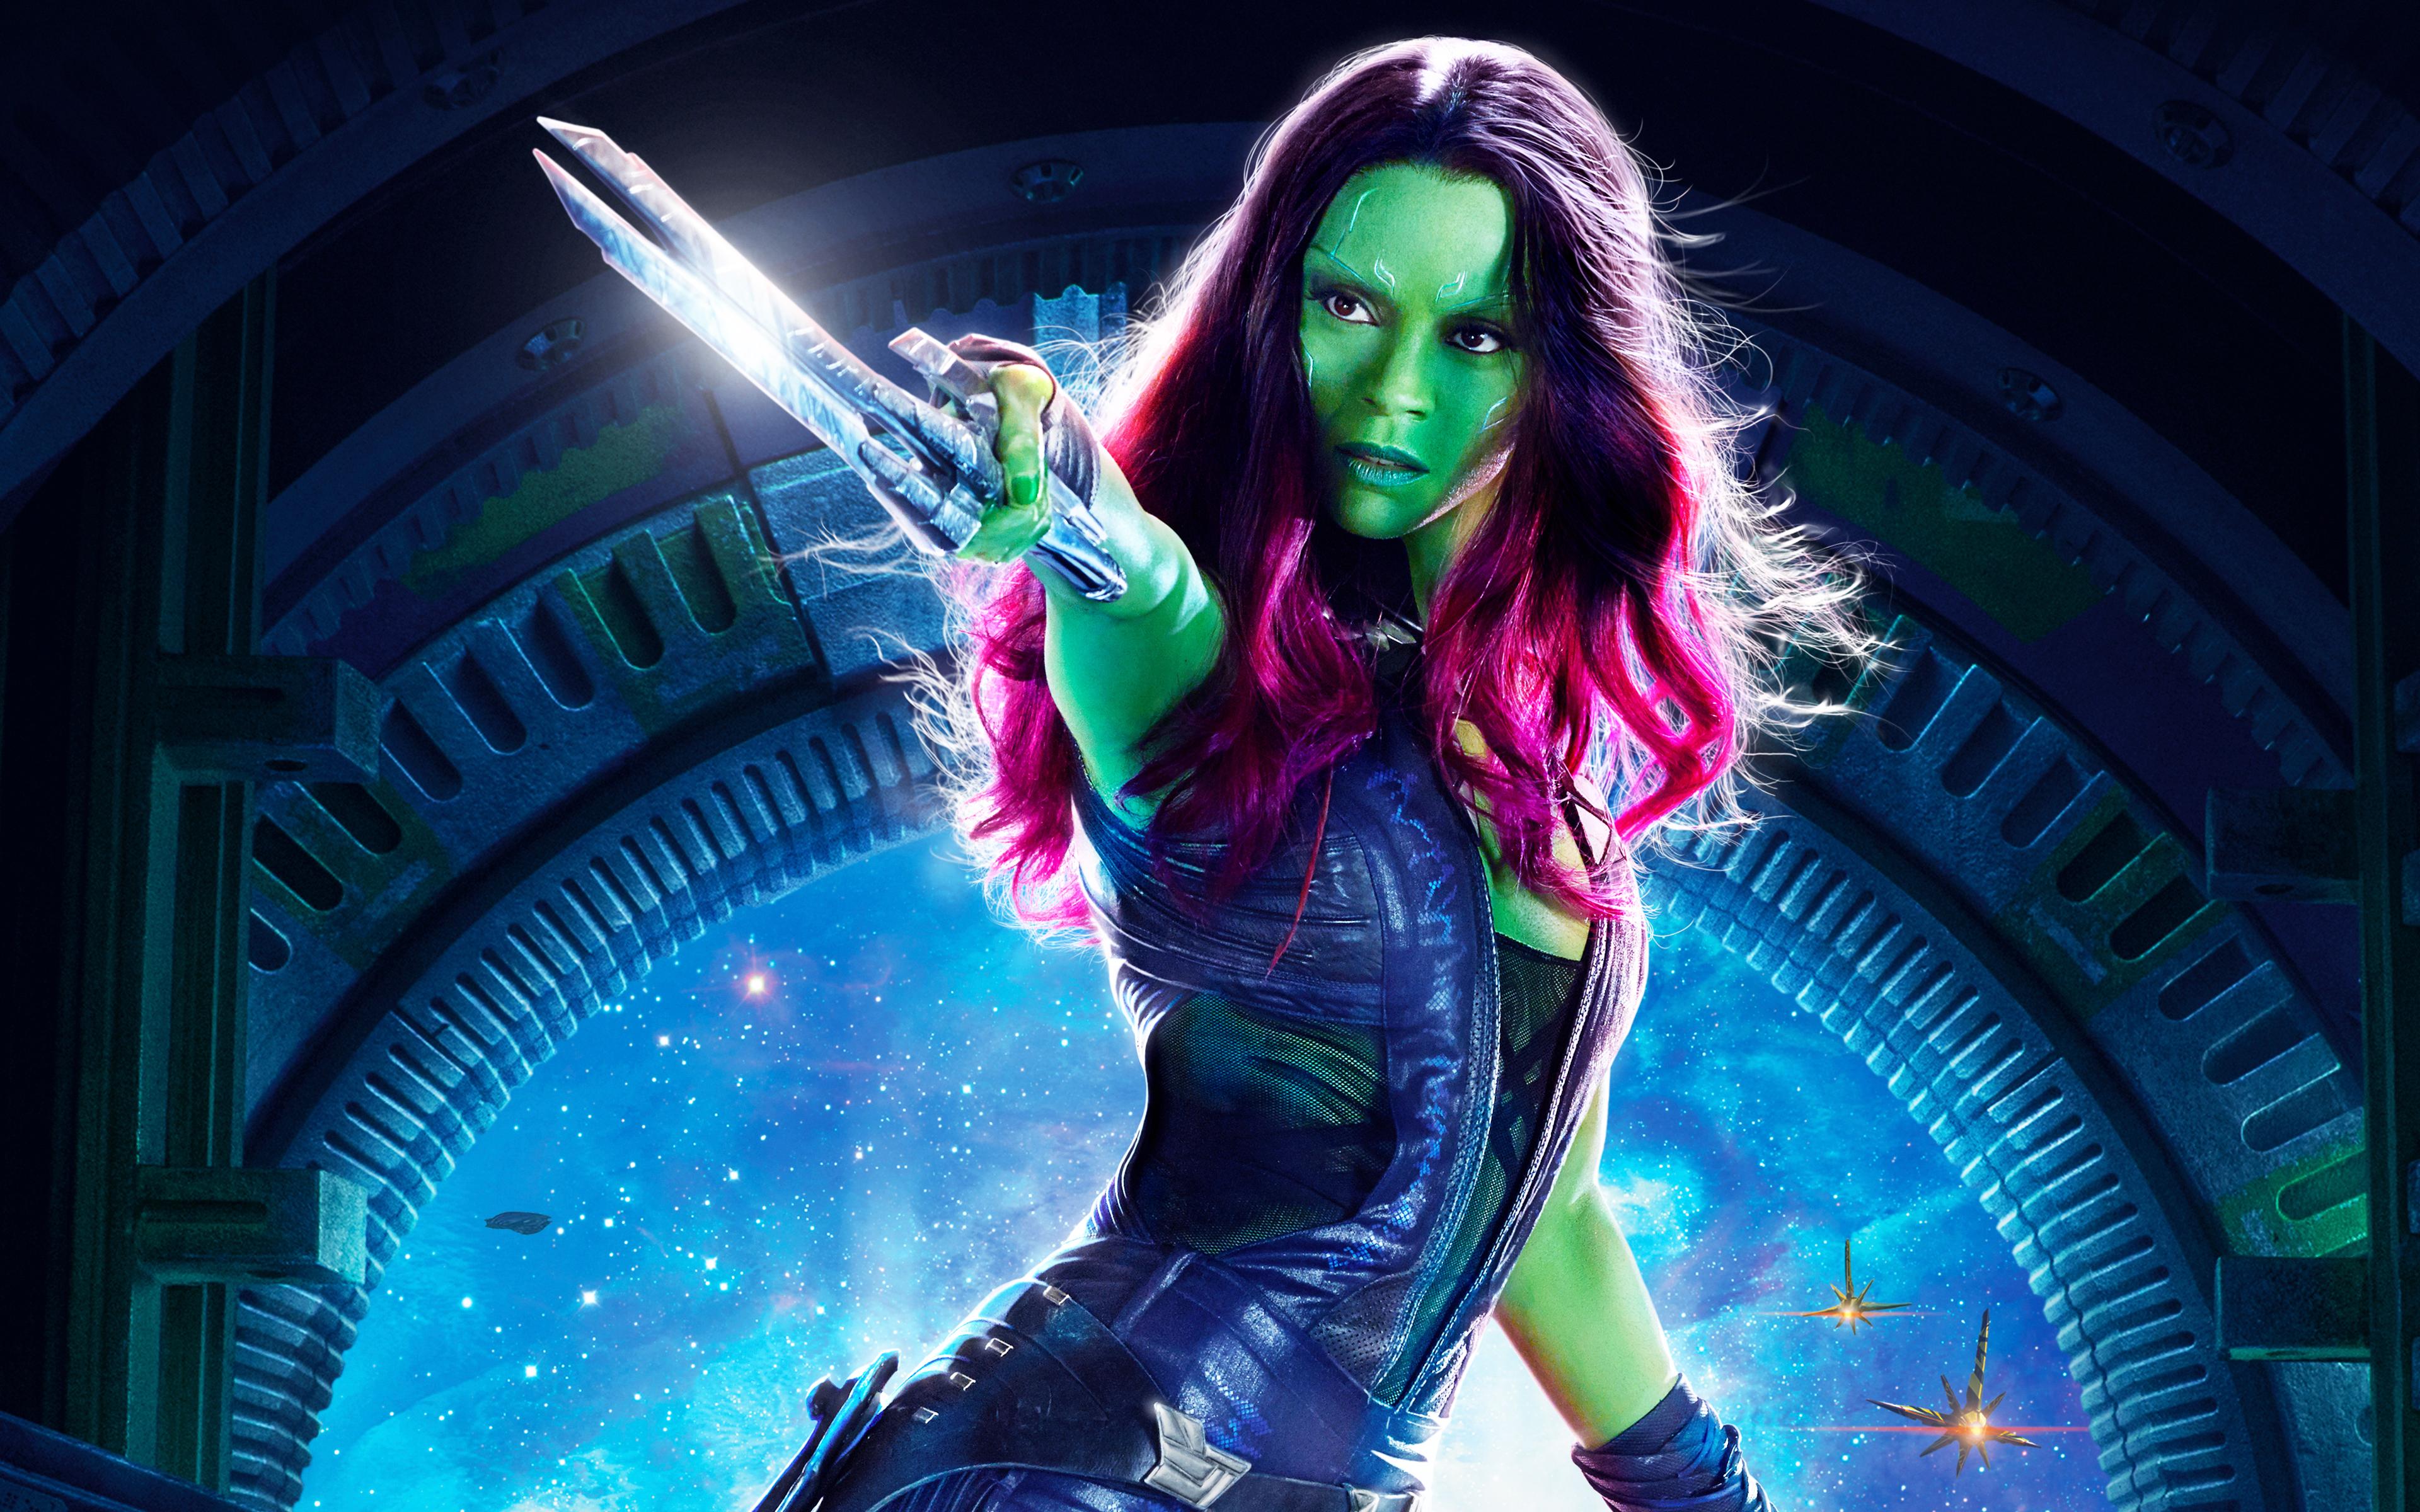 Gamora Guardians of the Galaxy Vol 2 Wallpaper Full HD 3840x2400